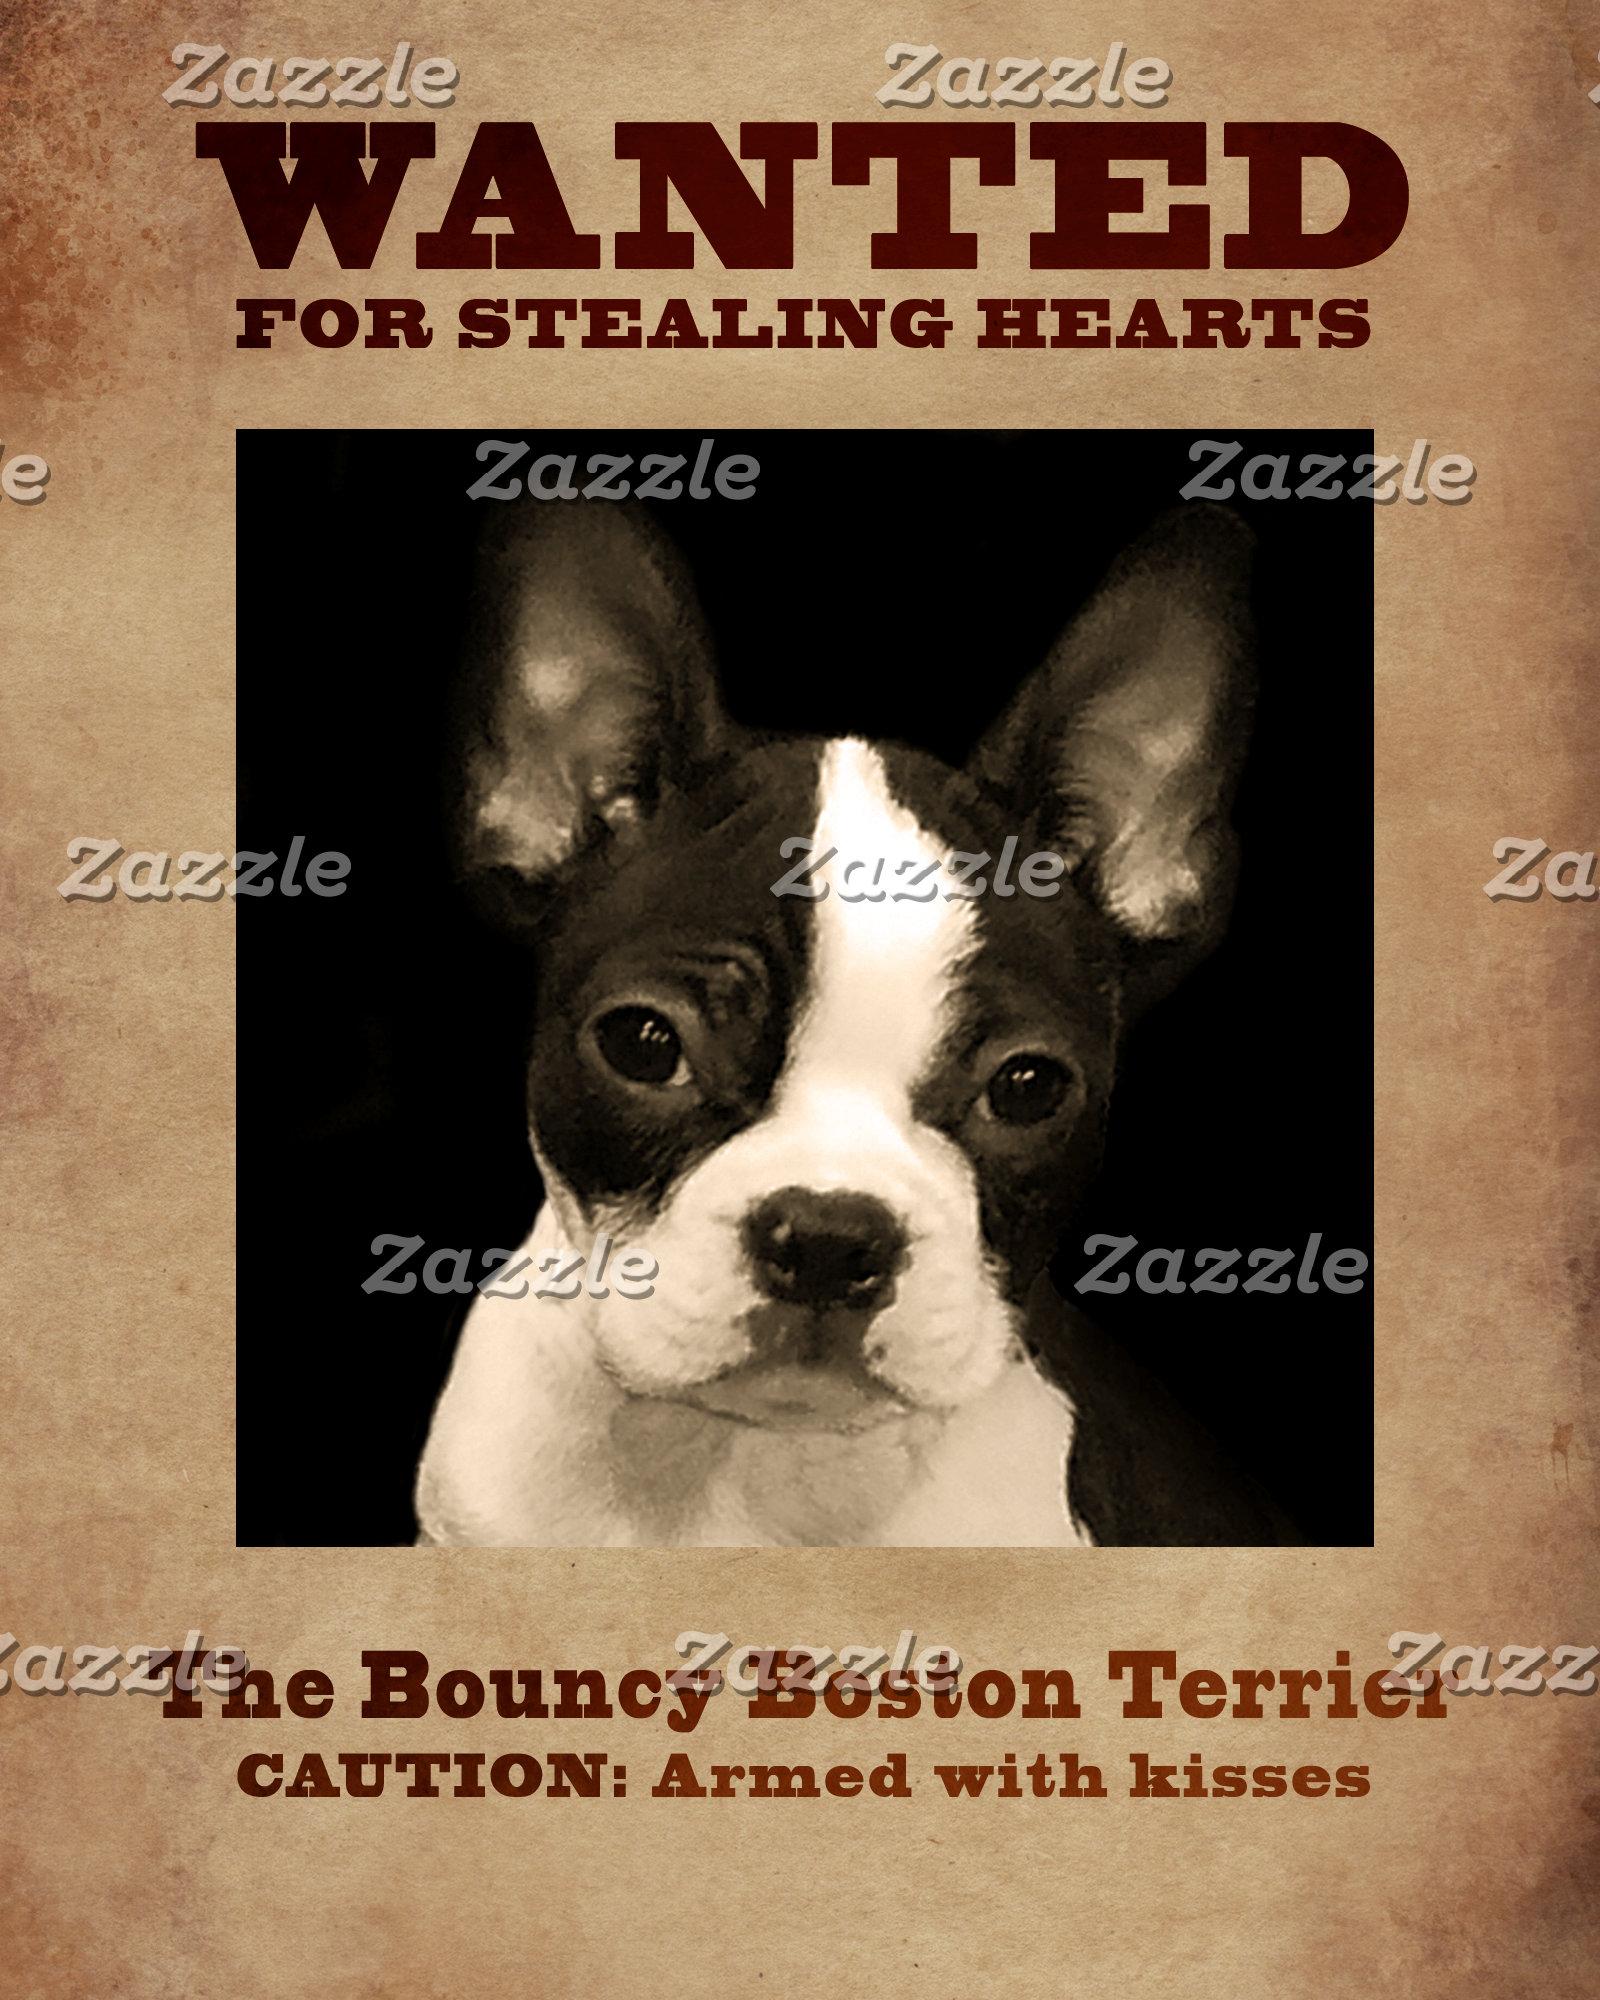 The Bouncy Boston Terrier